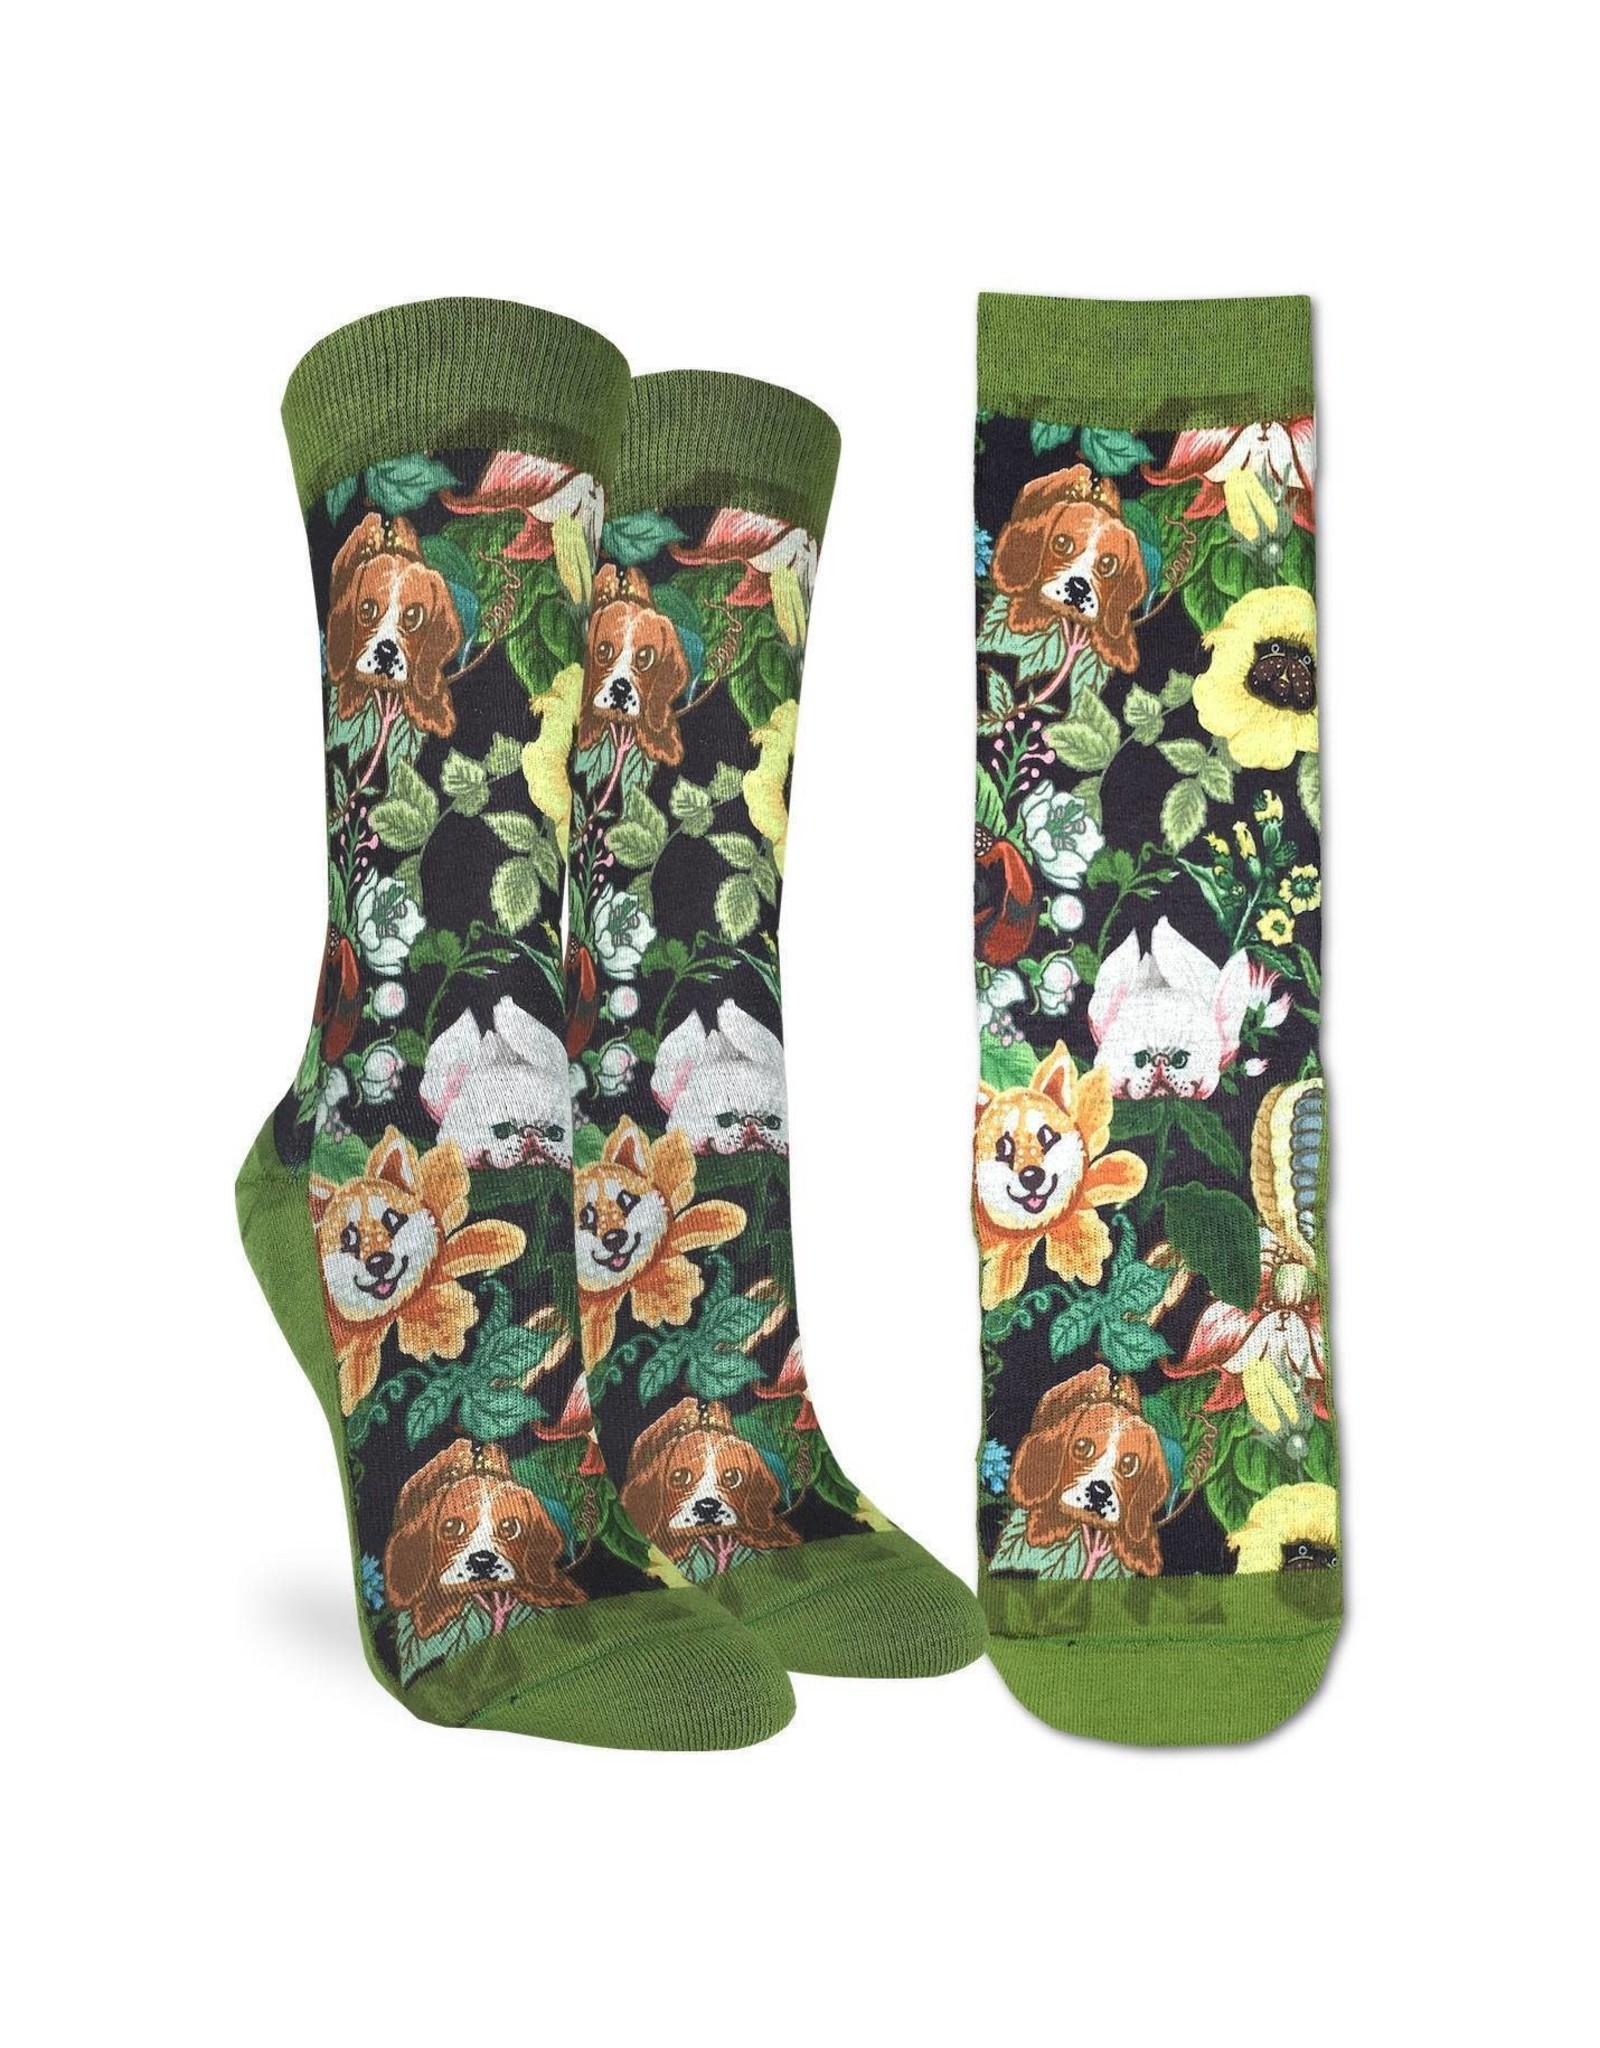 Good Luck Sock Floral Dogs Socks, 5-9